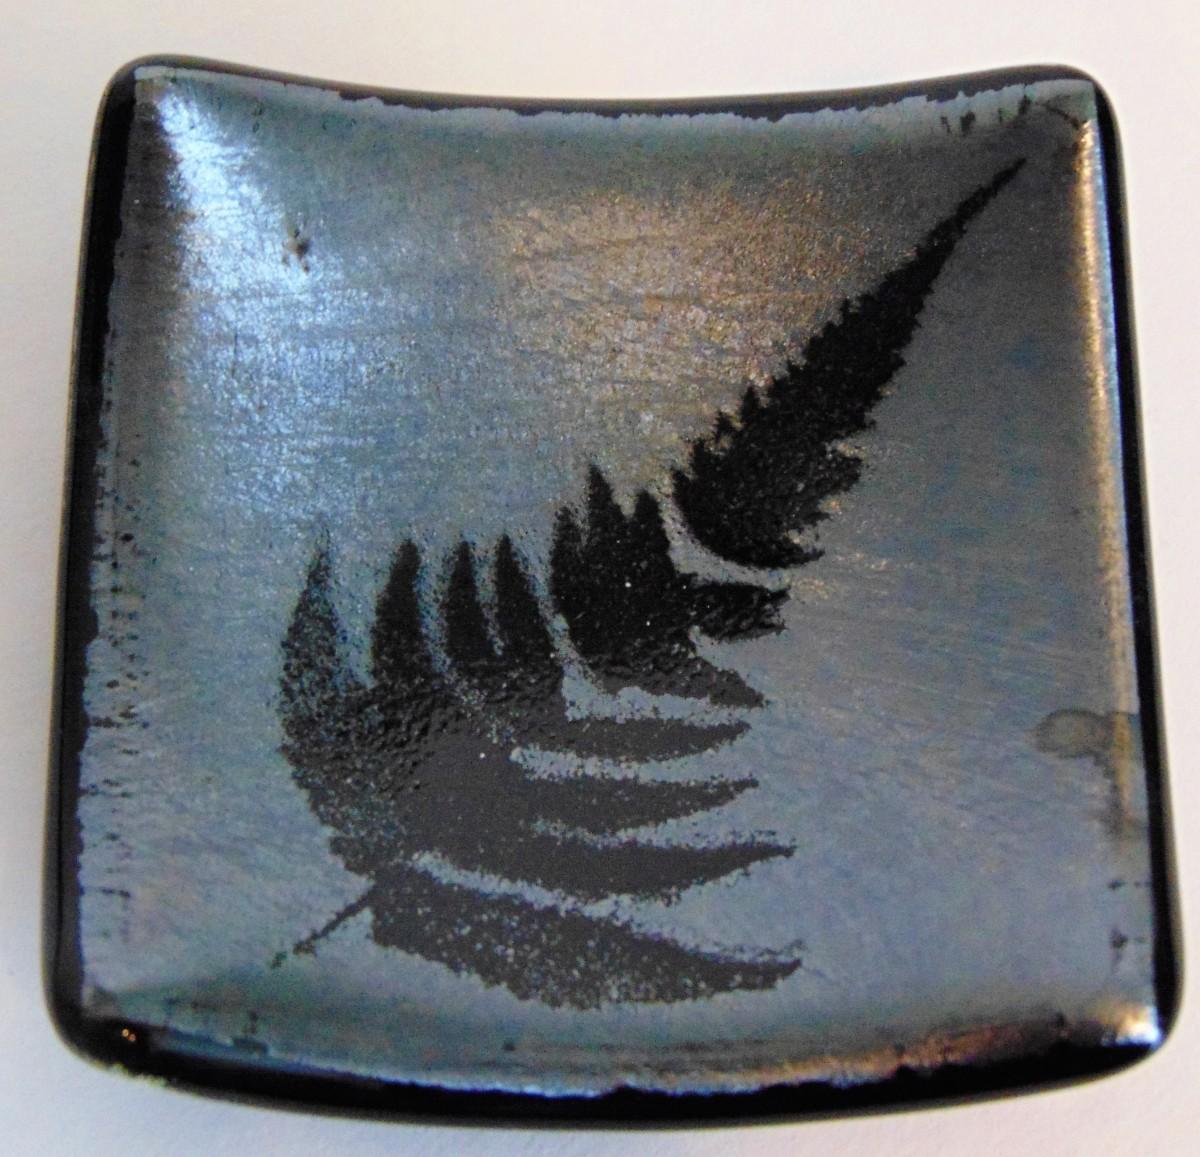 Small Plate-Fern on Silver Irid